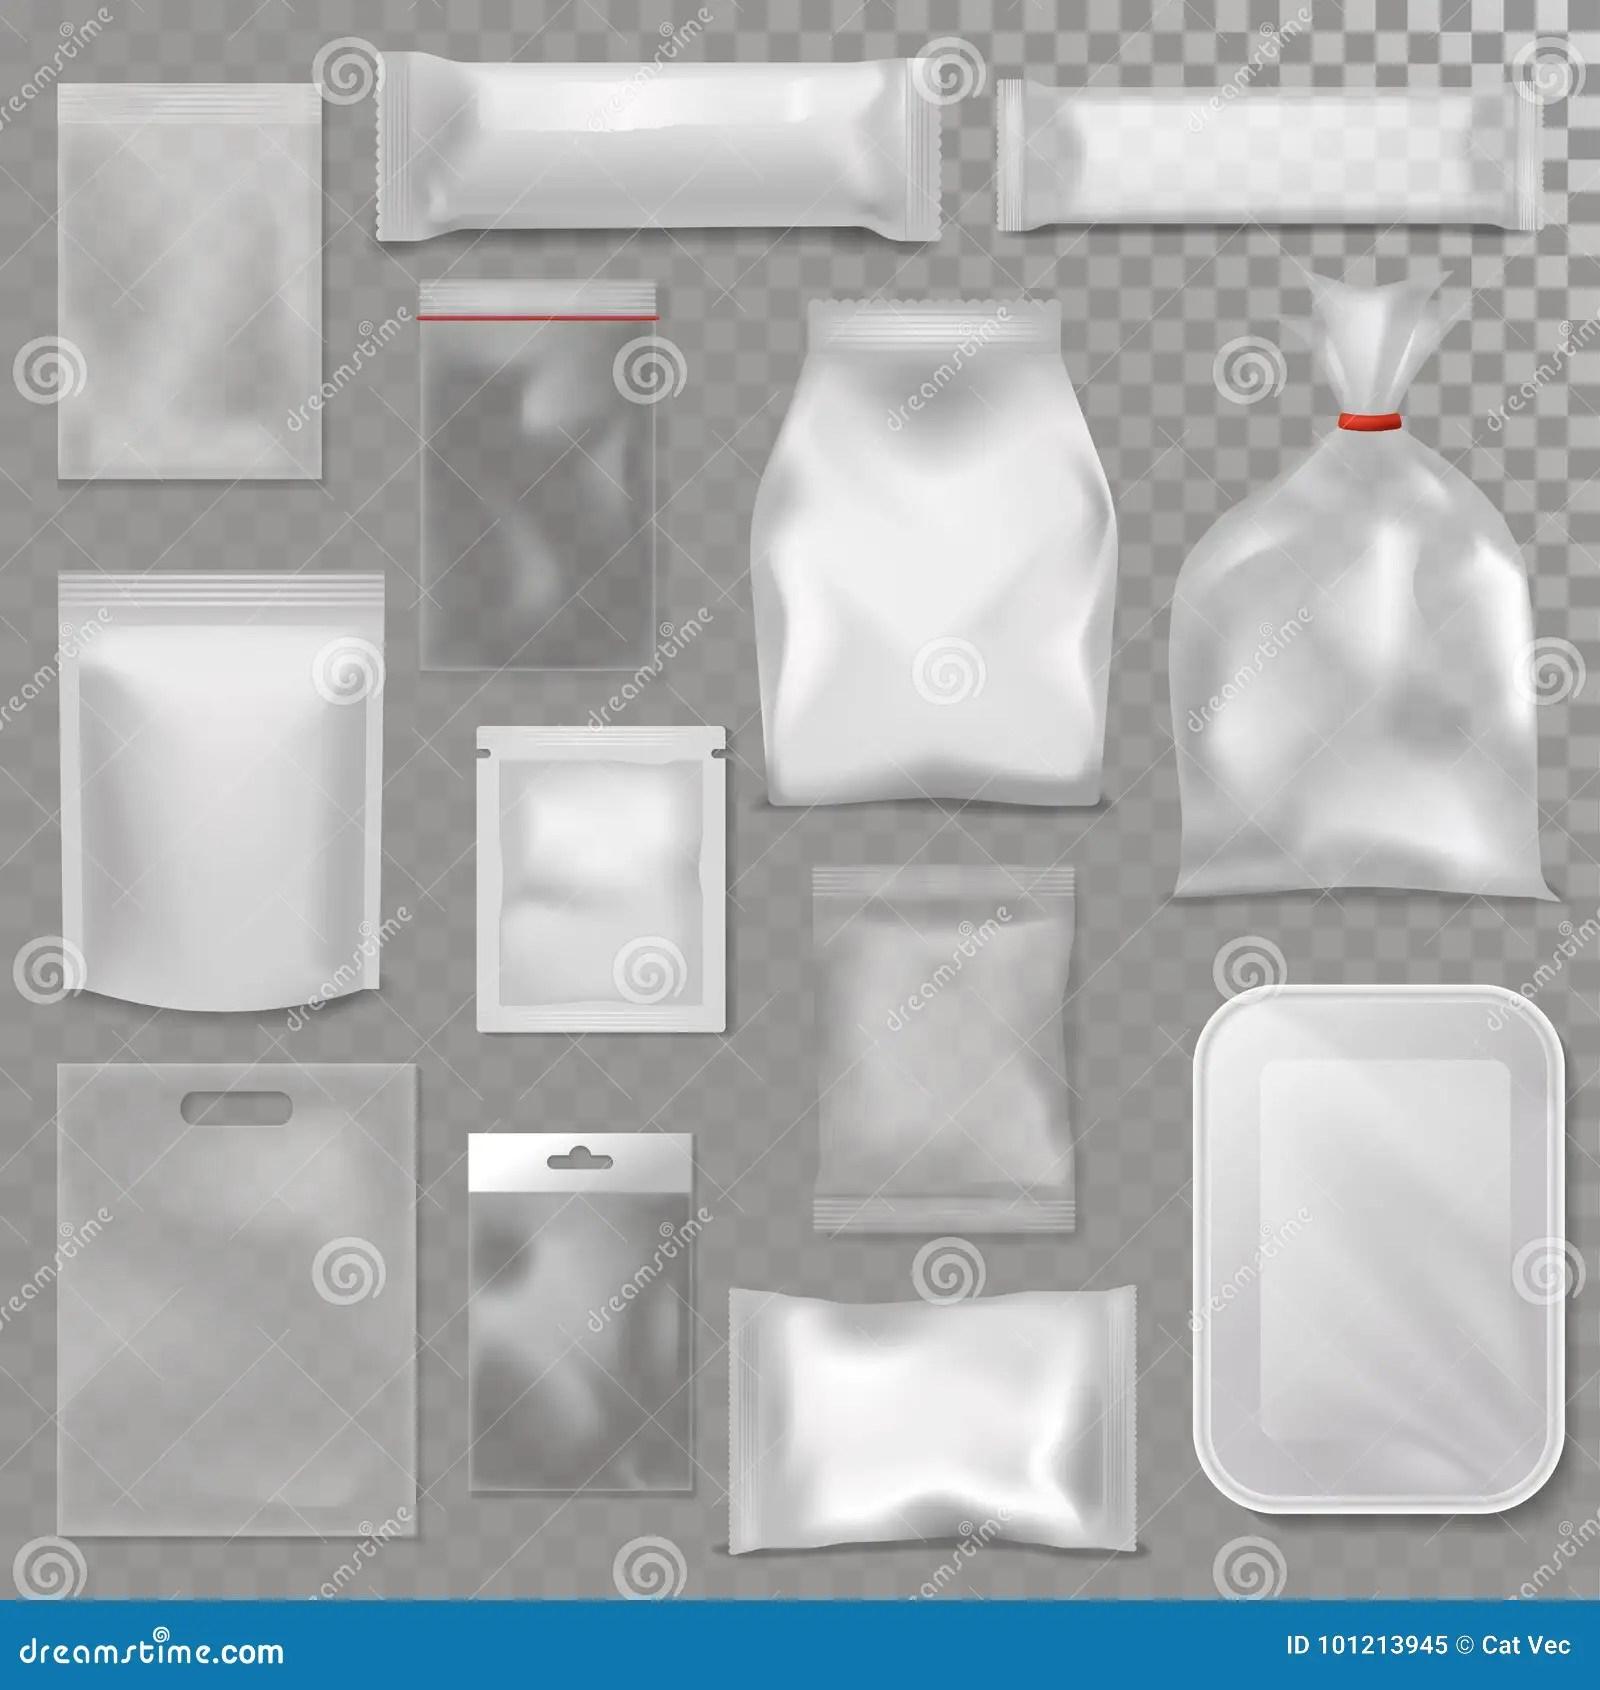 Illustrations for plastic free educational website world changing pollution cup bag dental care. Bag Mockup Stock Illustrations 13 998 Bag Mockup Stock Illustrations Vectors Clipart Dreamstime